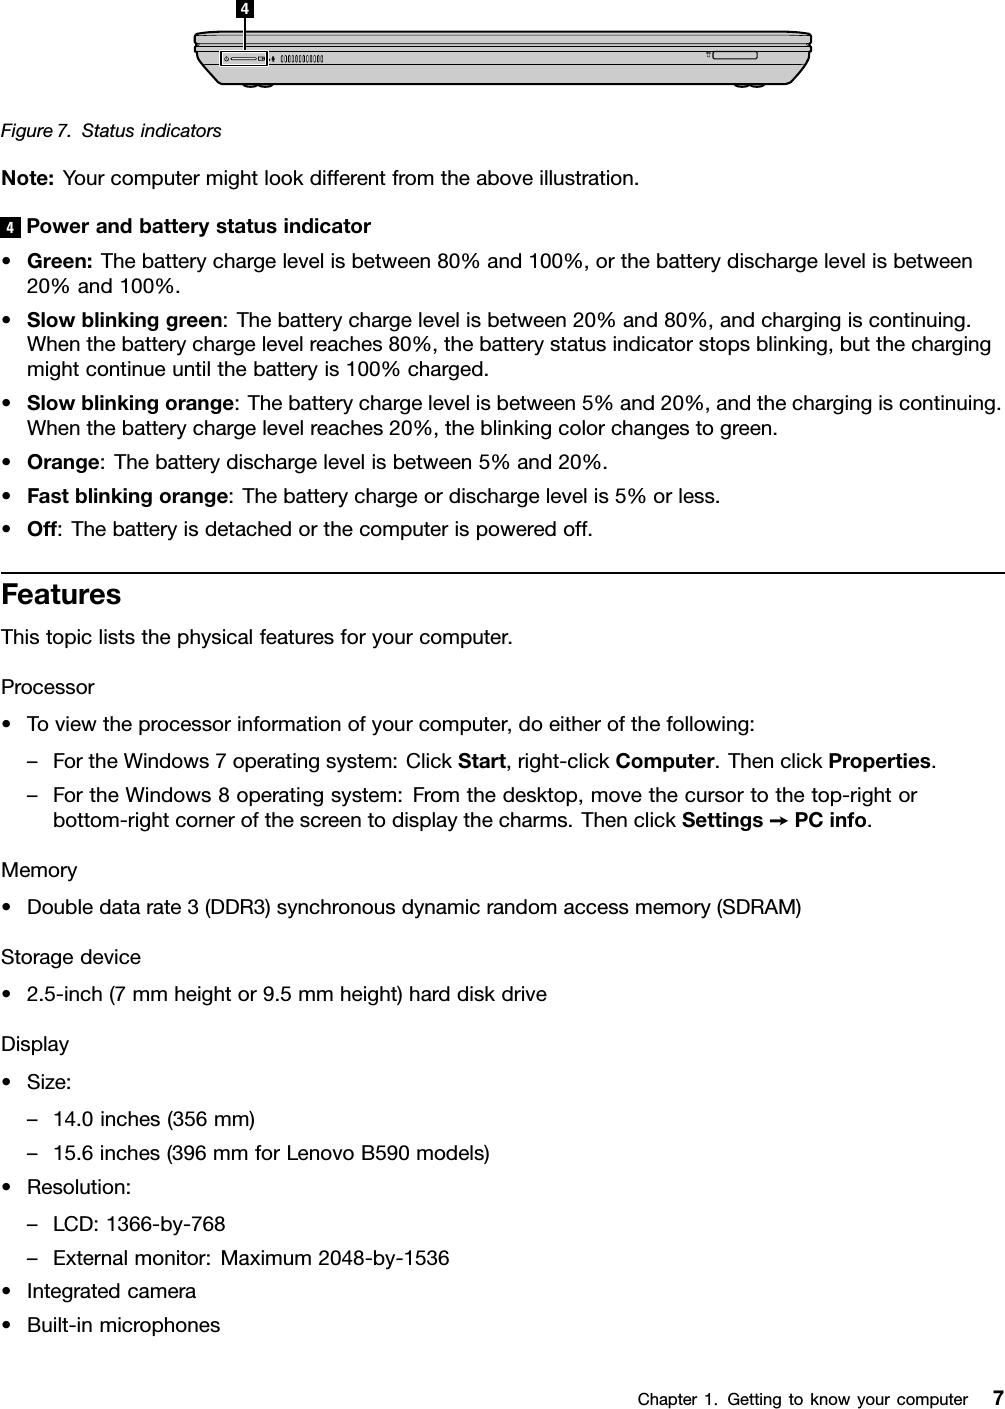 Lenovo B490 B43Xx B590 Ug En User Manual Guide B490, B590, Laptop